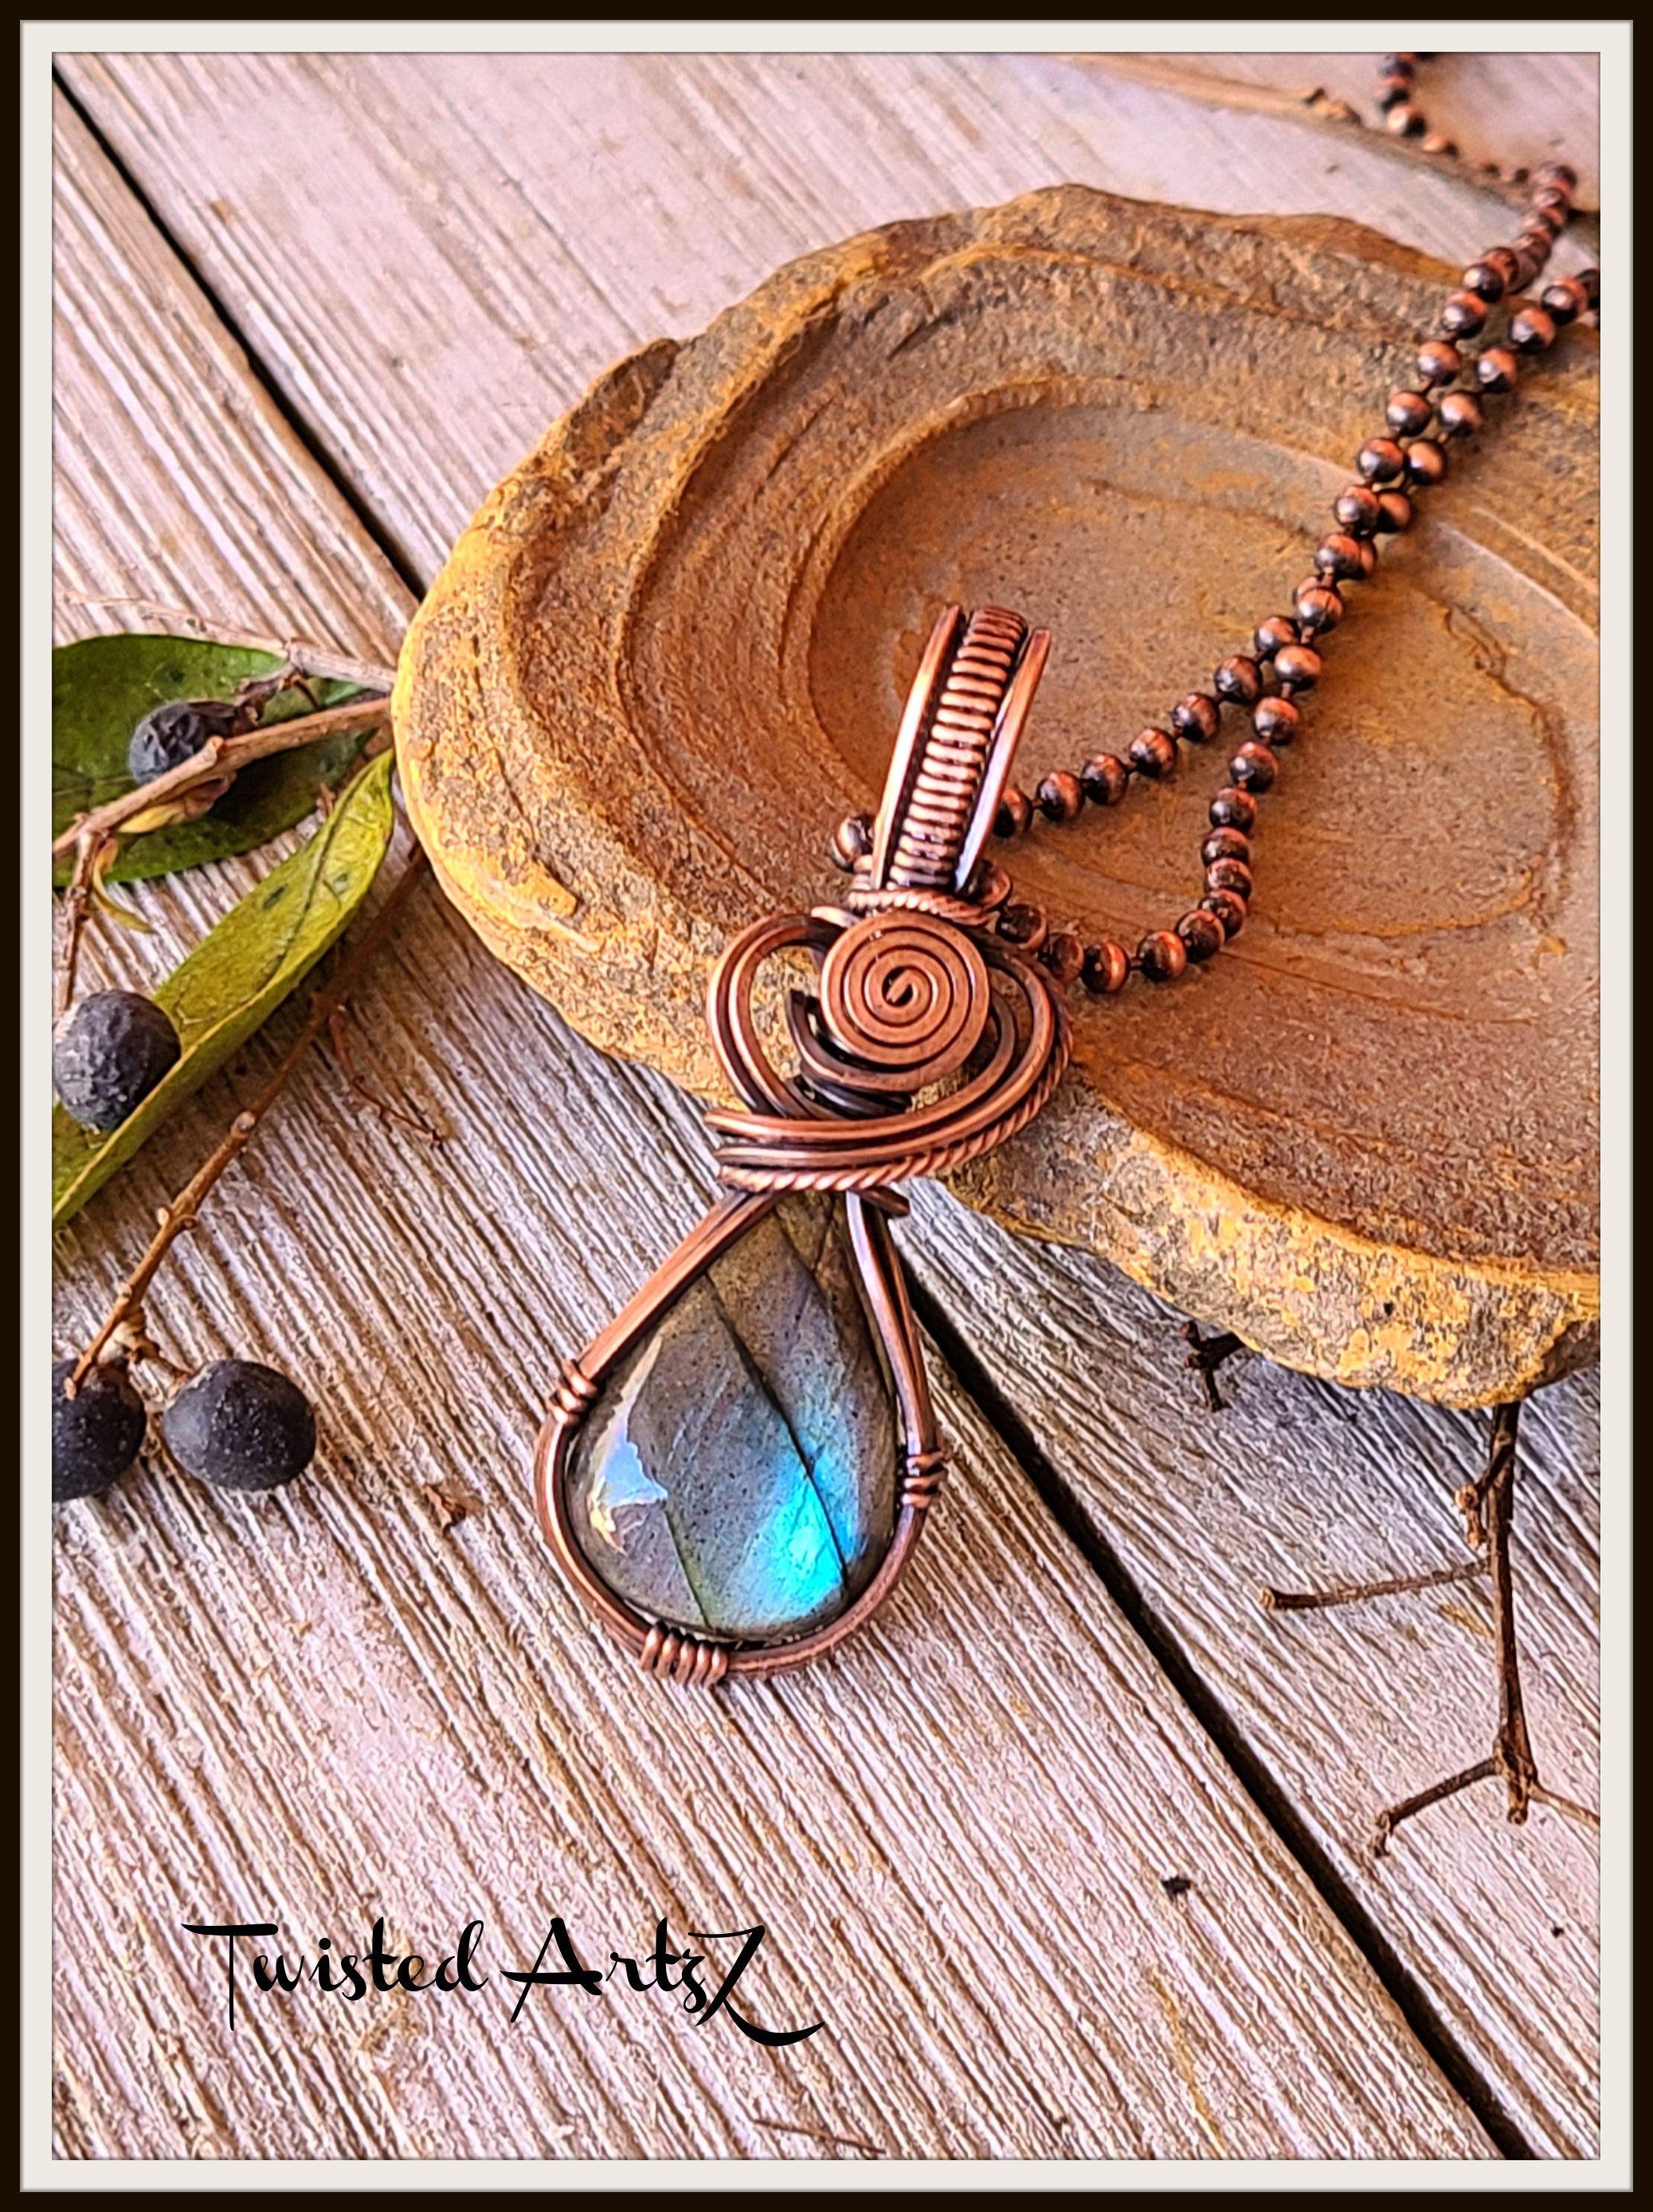 Handmade Wire Wrap Jewelry Necklace Pendant Copper Wire Wrap Pendant Natural Stone Necklace Cobra Jasper Stone Pendant